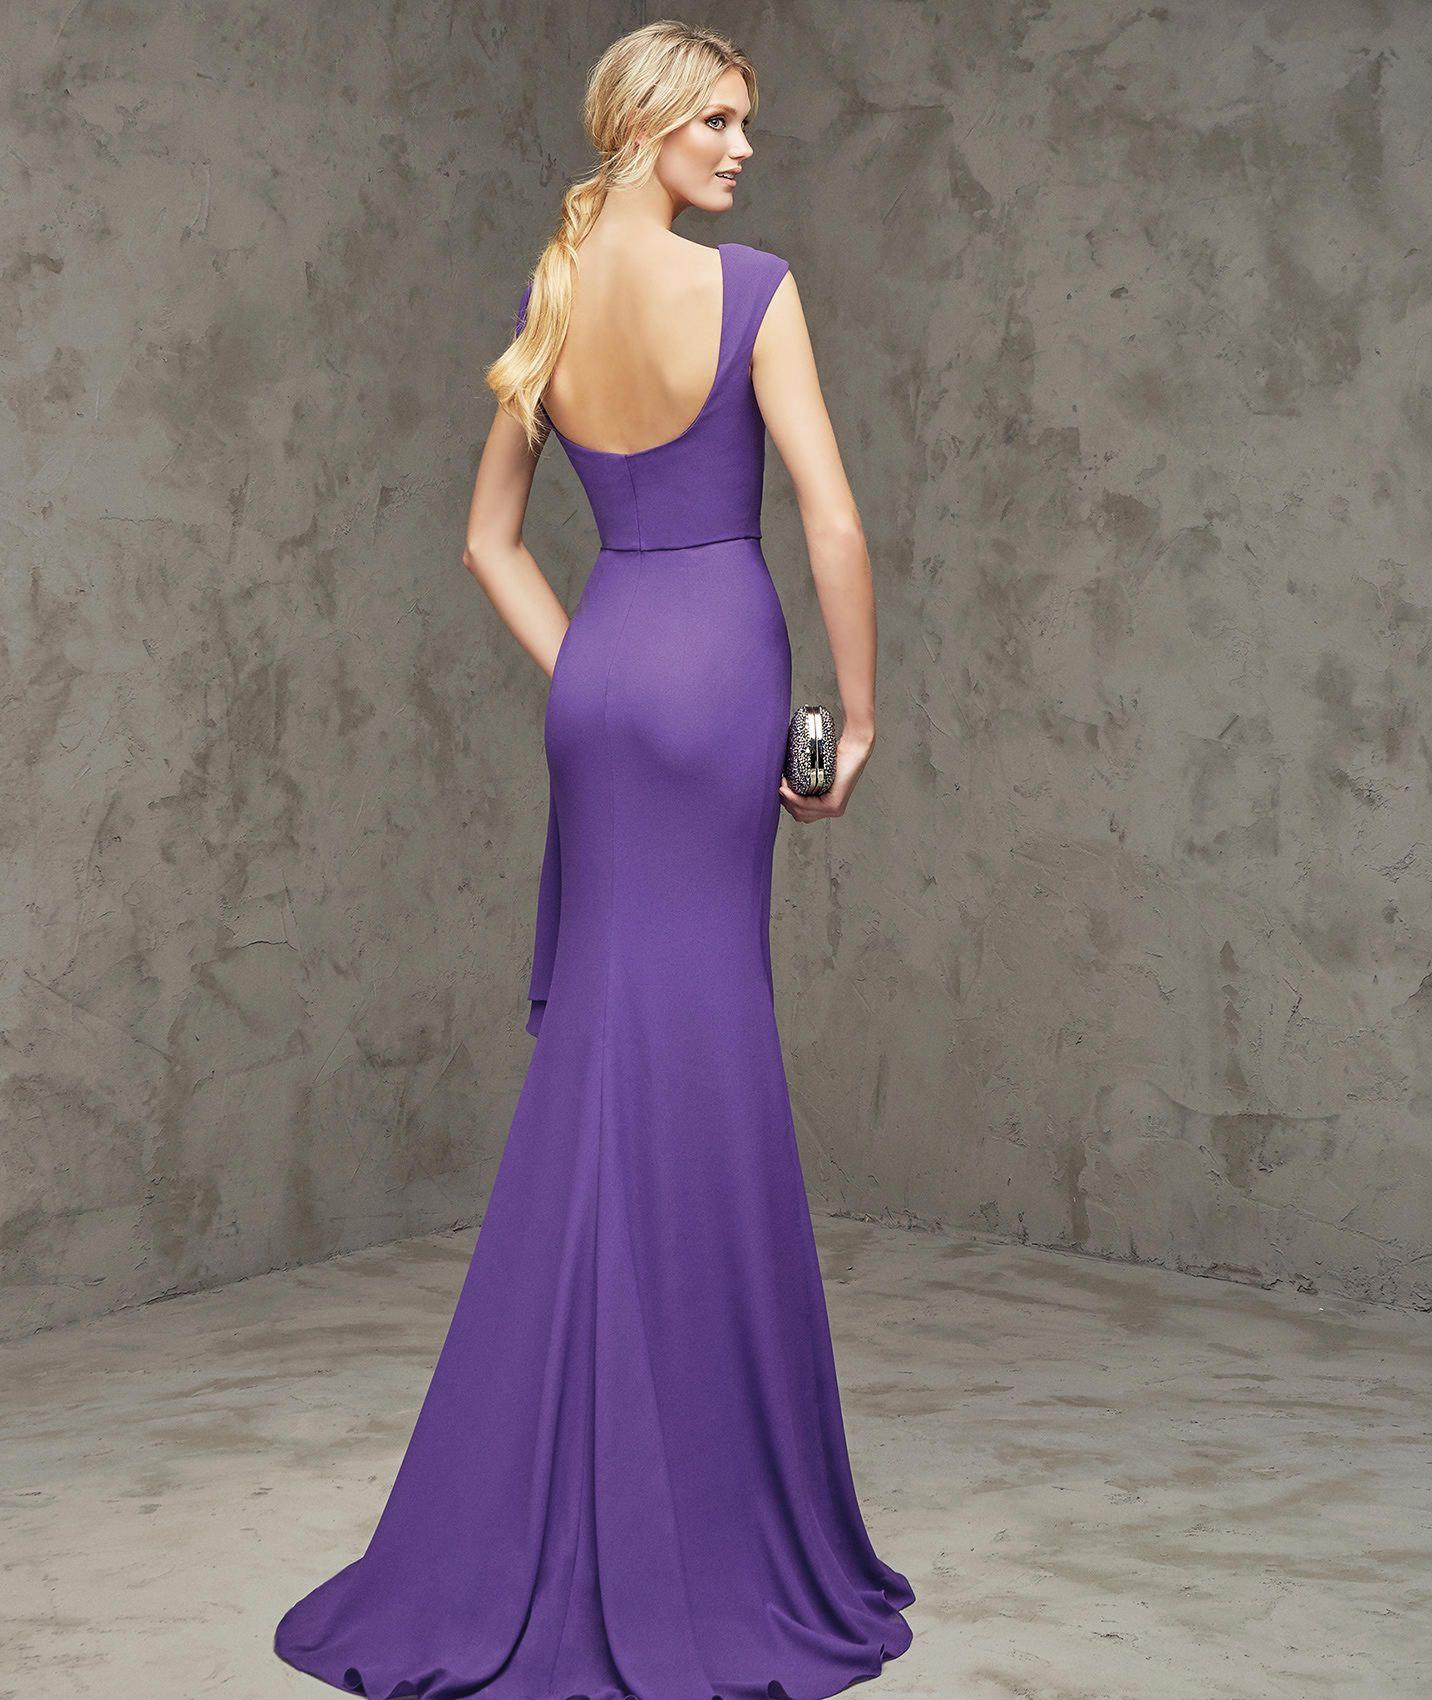 Vistoso Donar Vestidos De Novia Ideas Ornamento Elaboración ...